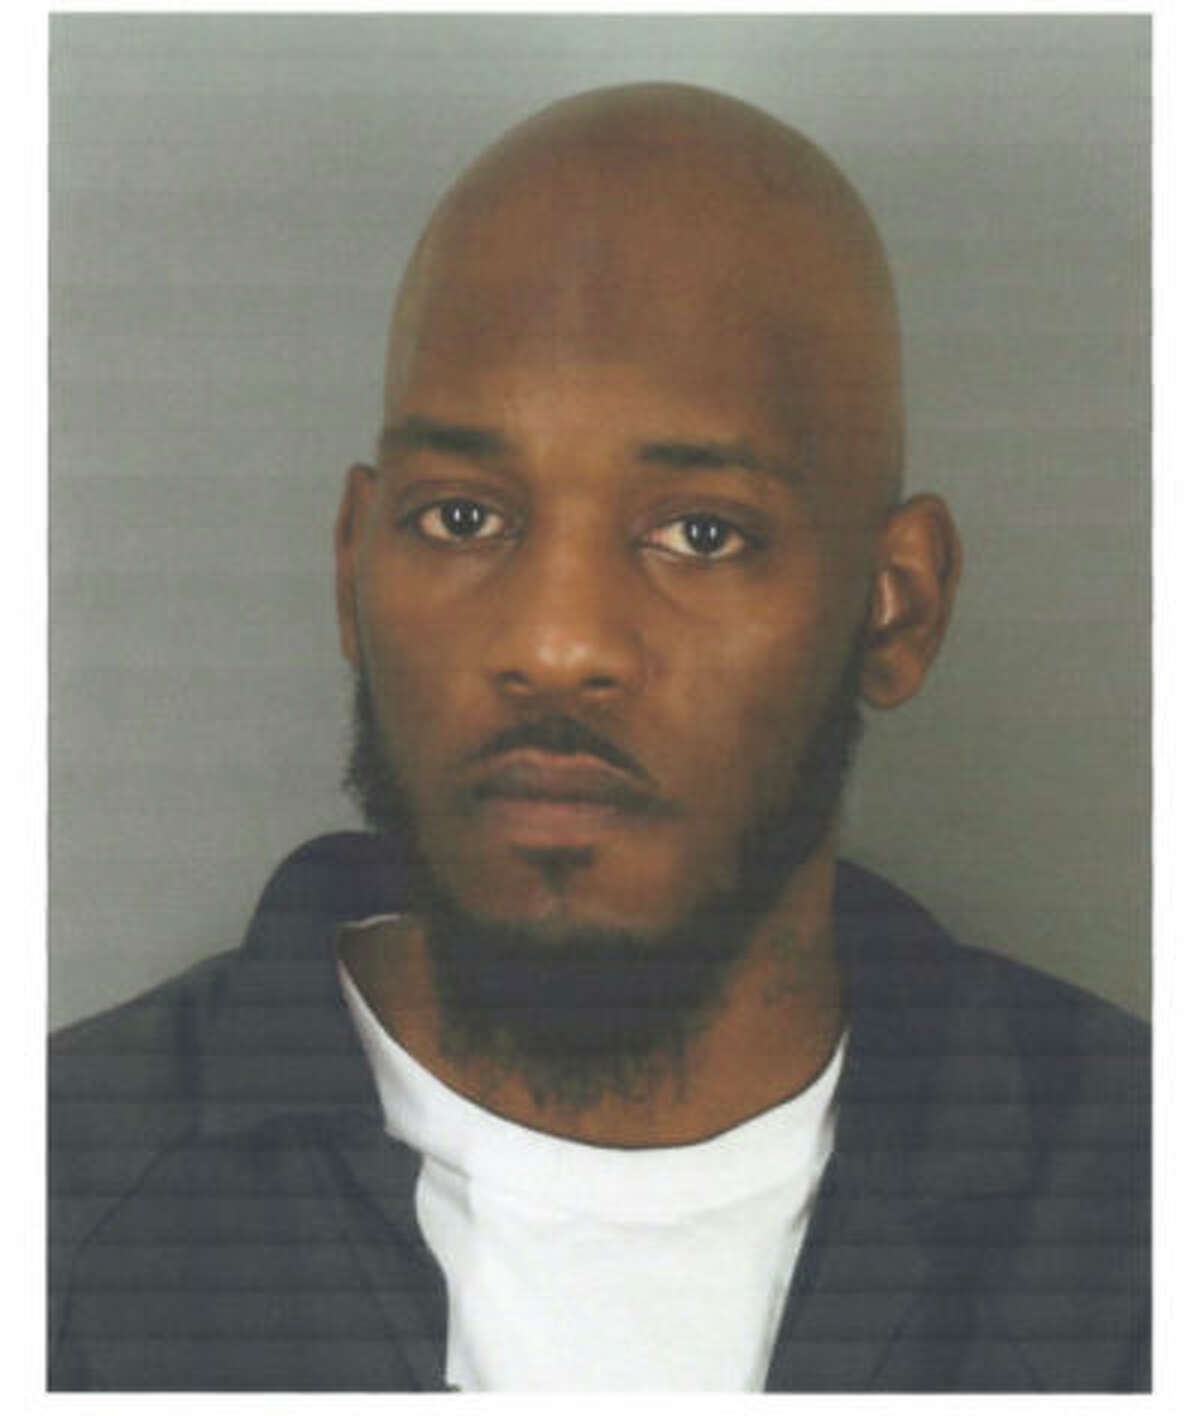 Xavier Joseph, 28, of Beaumont